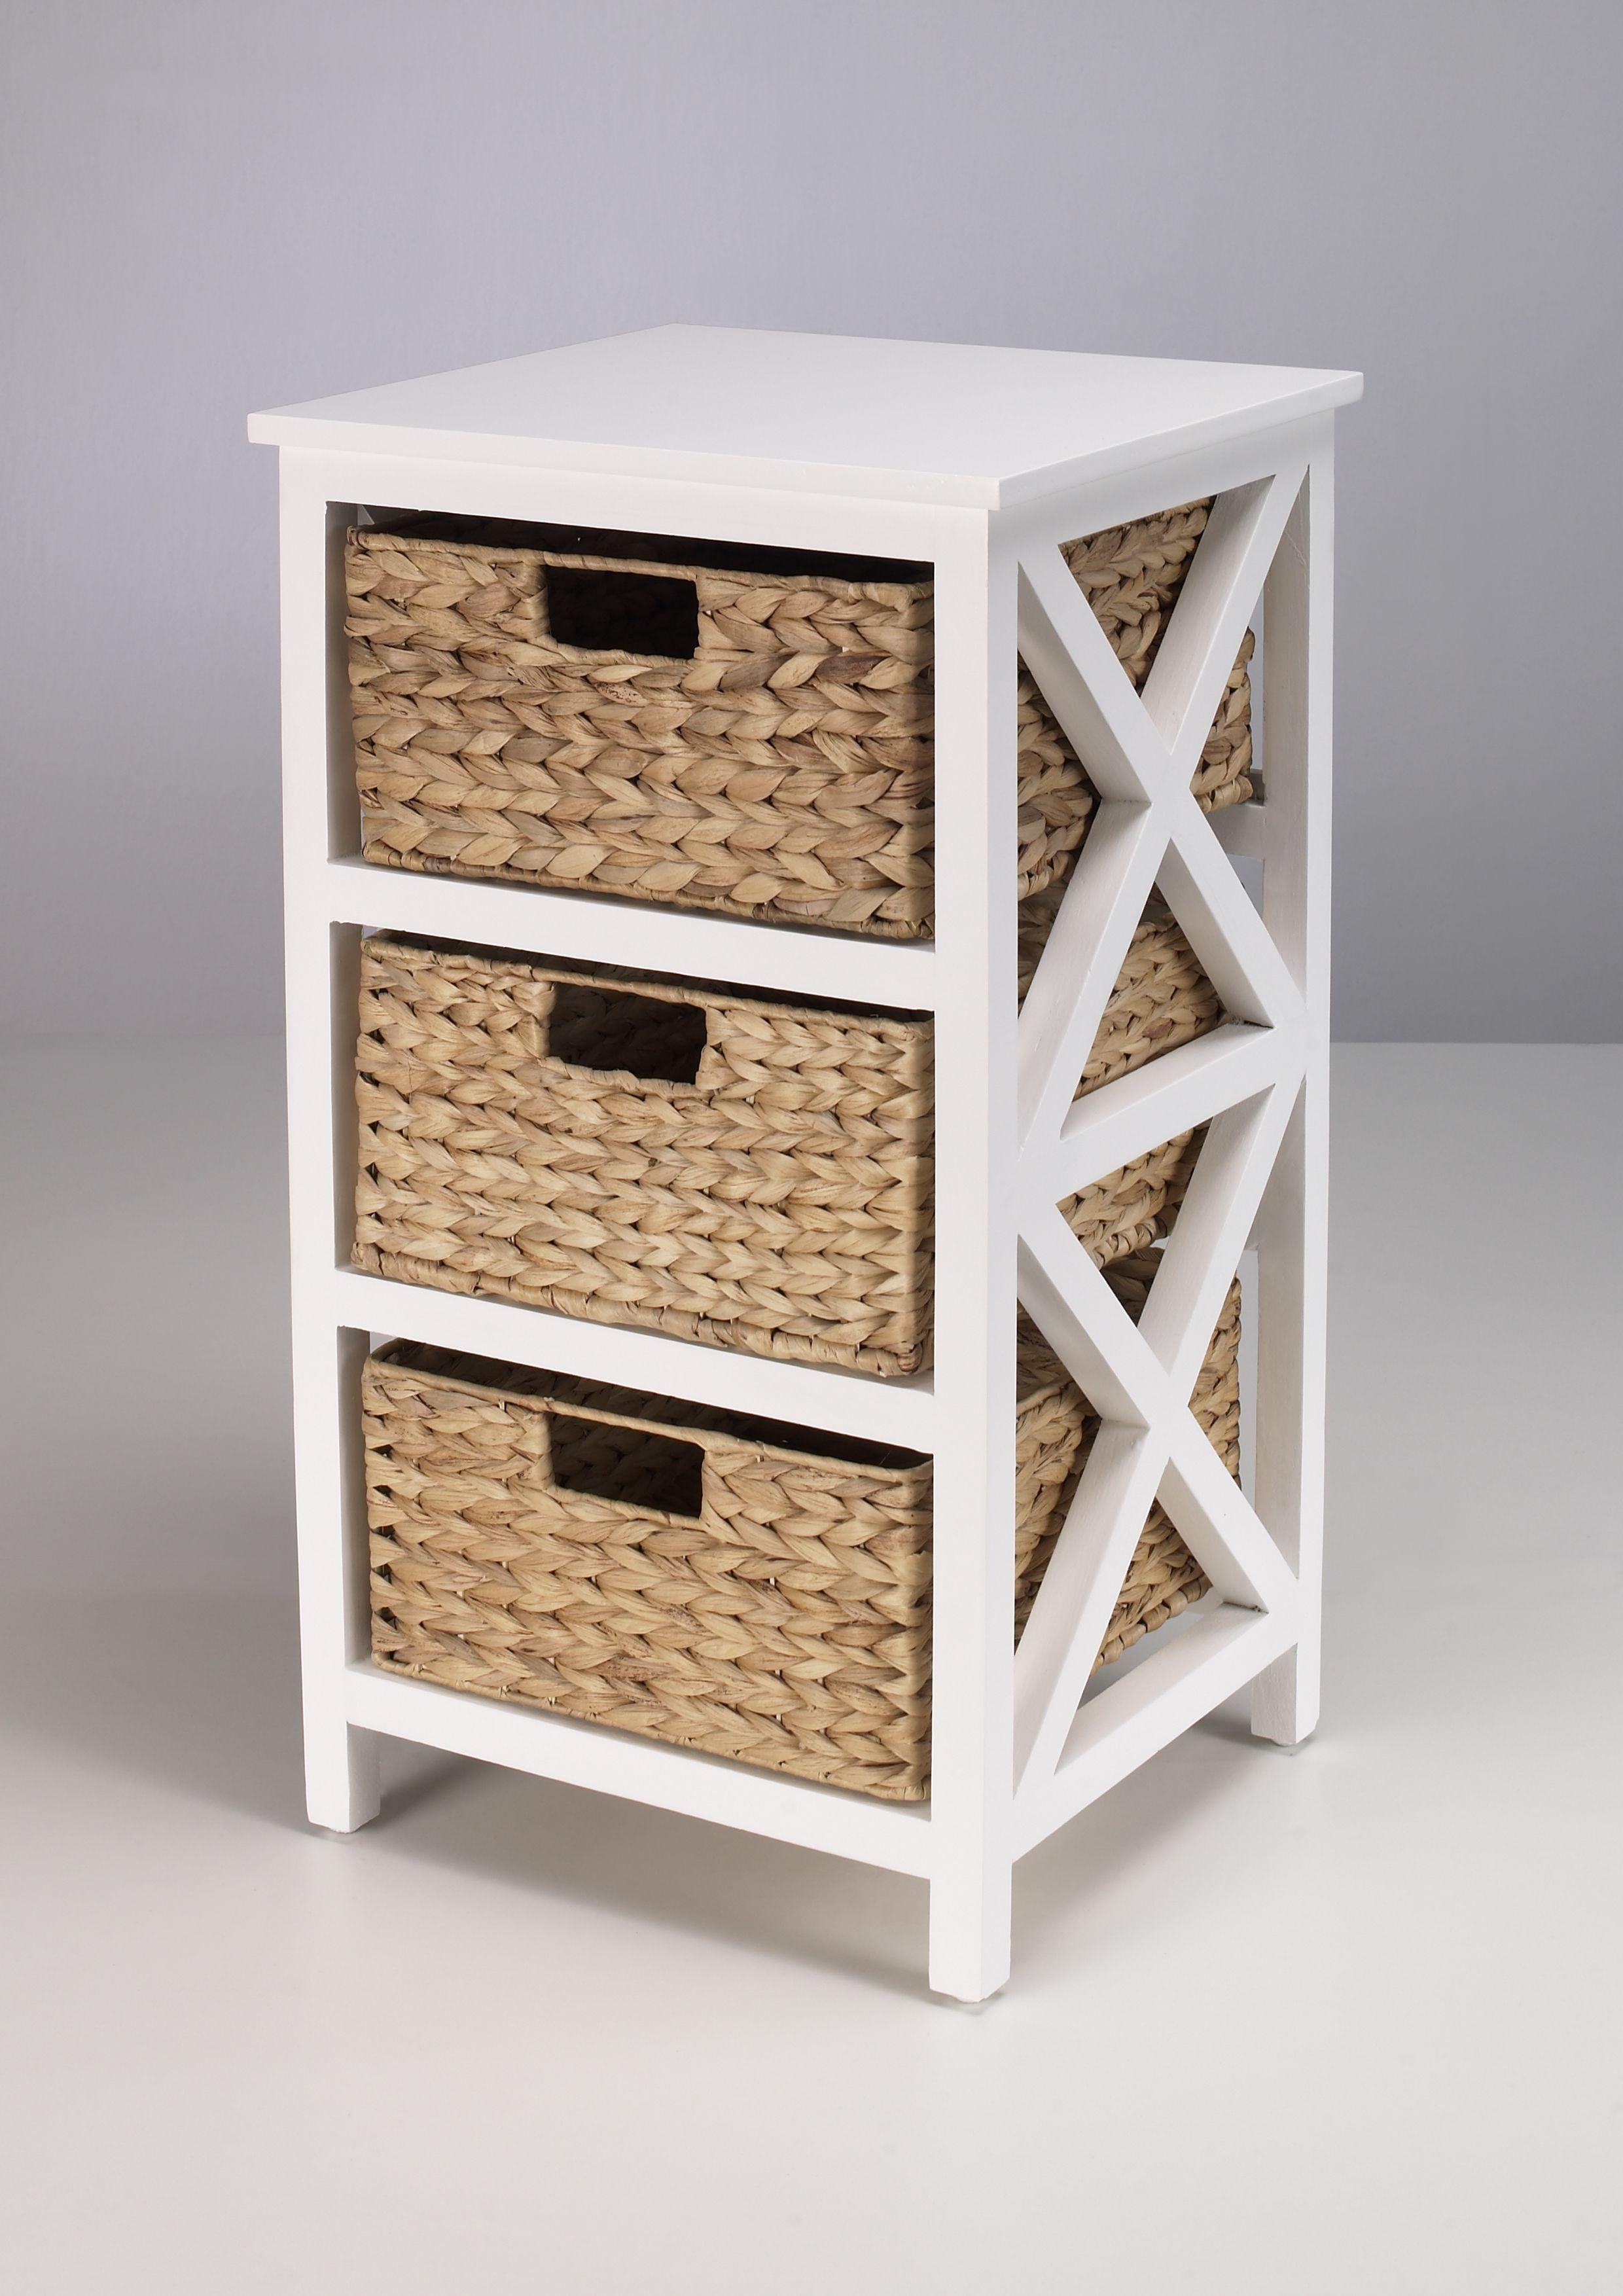 Kommode Beistelltisch Nachttisch Holz weiß lackiert 3S